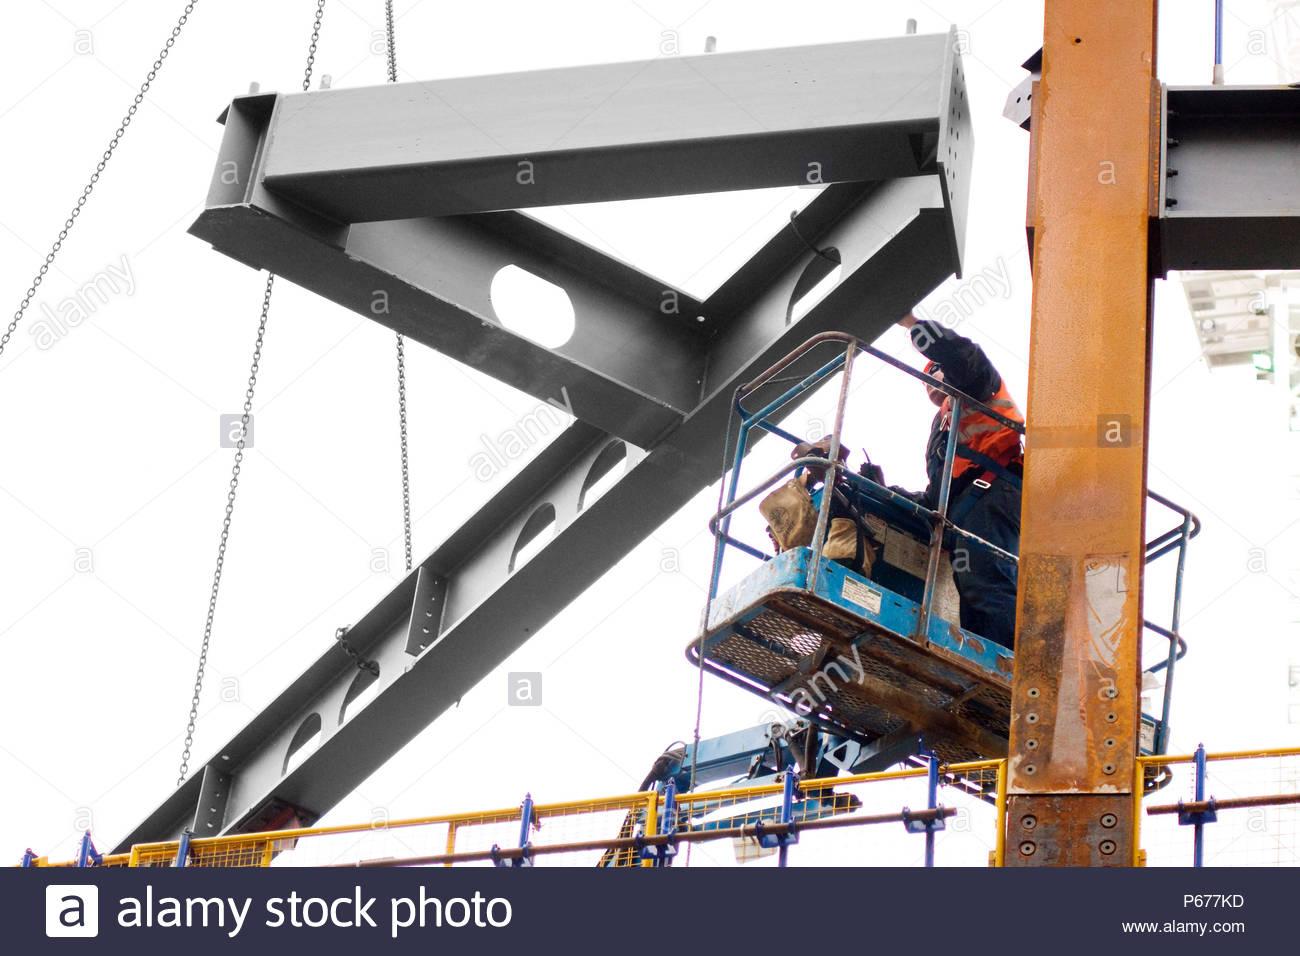 Stahlrahmen Konstruktion Balken, die walbrook, London, UK Stockfoto ...